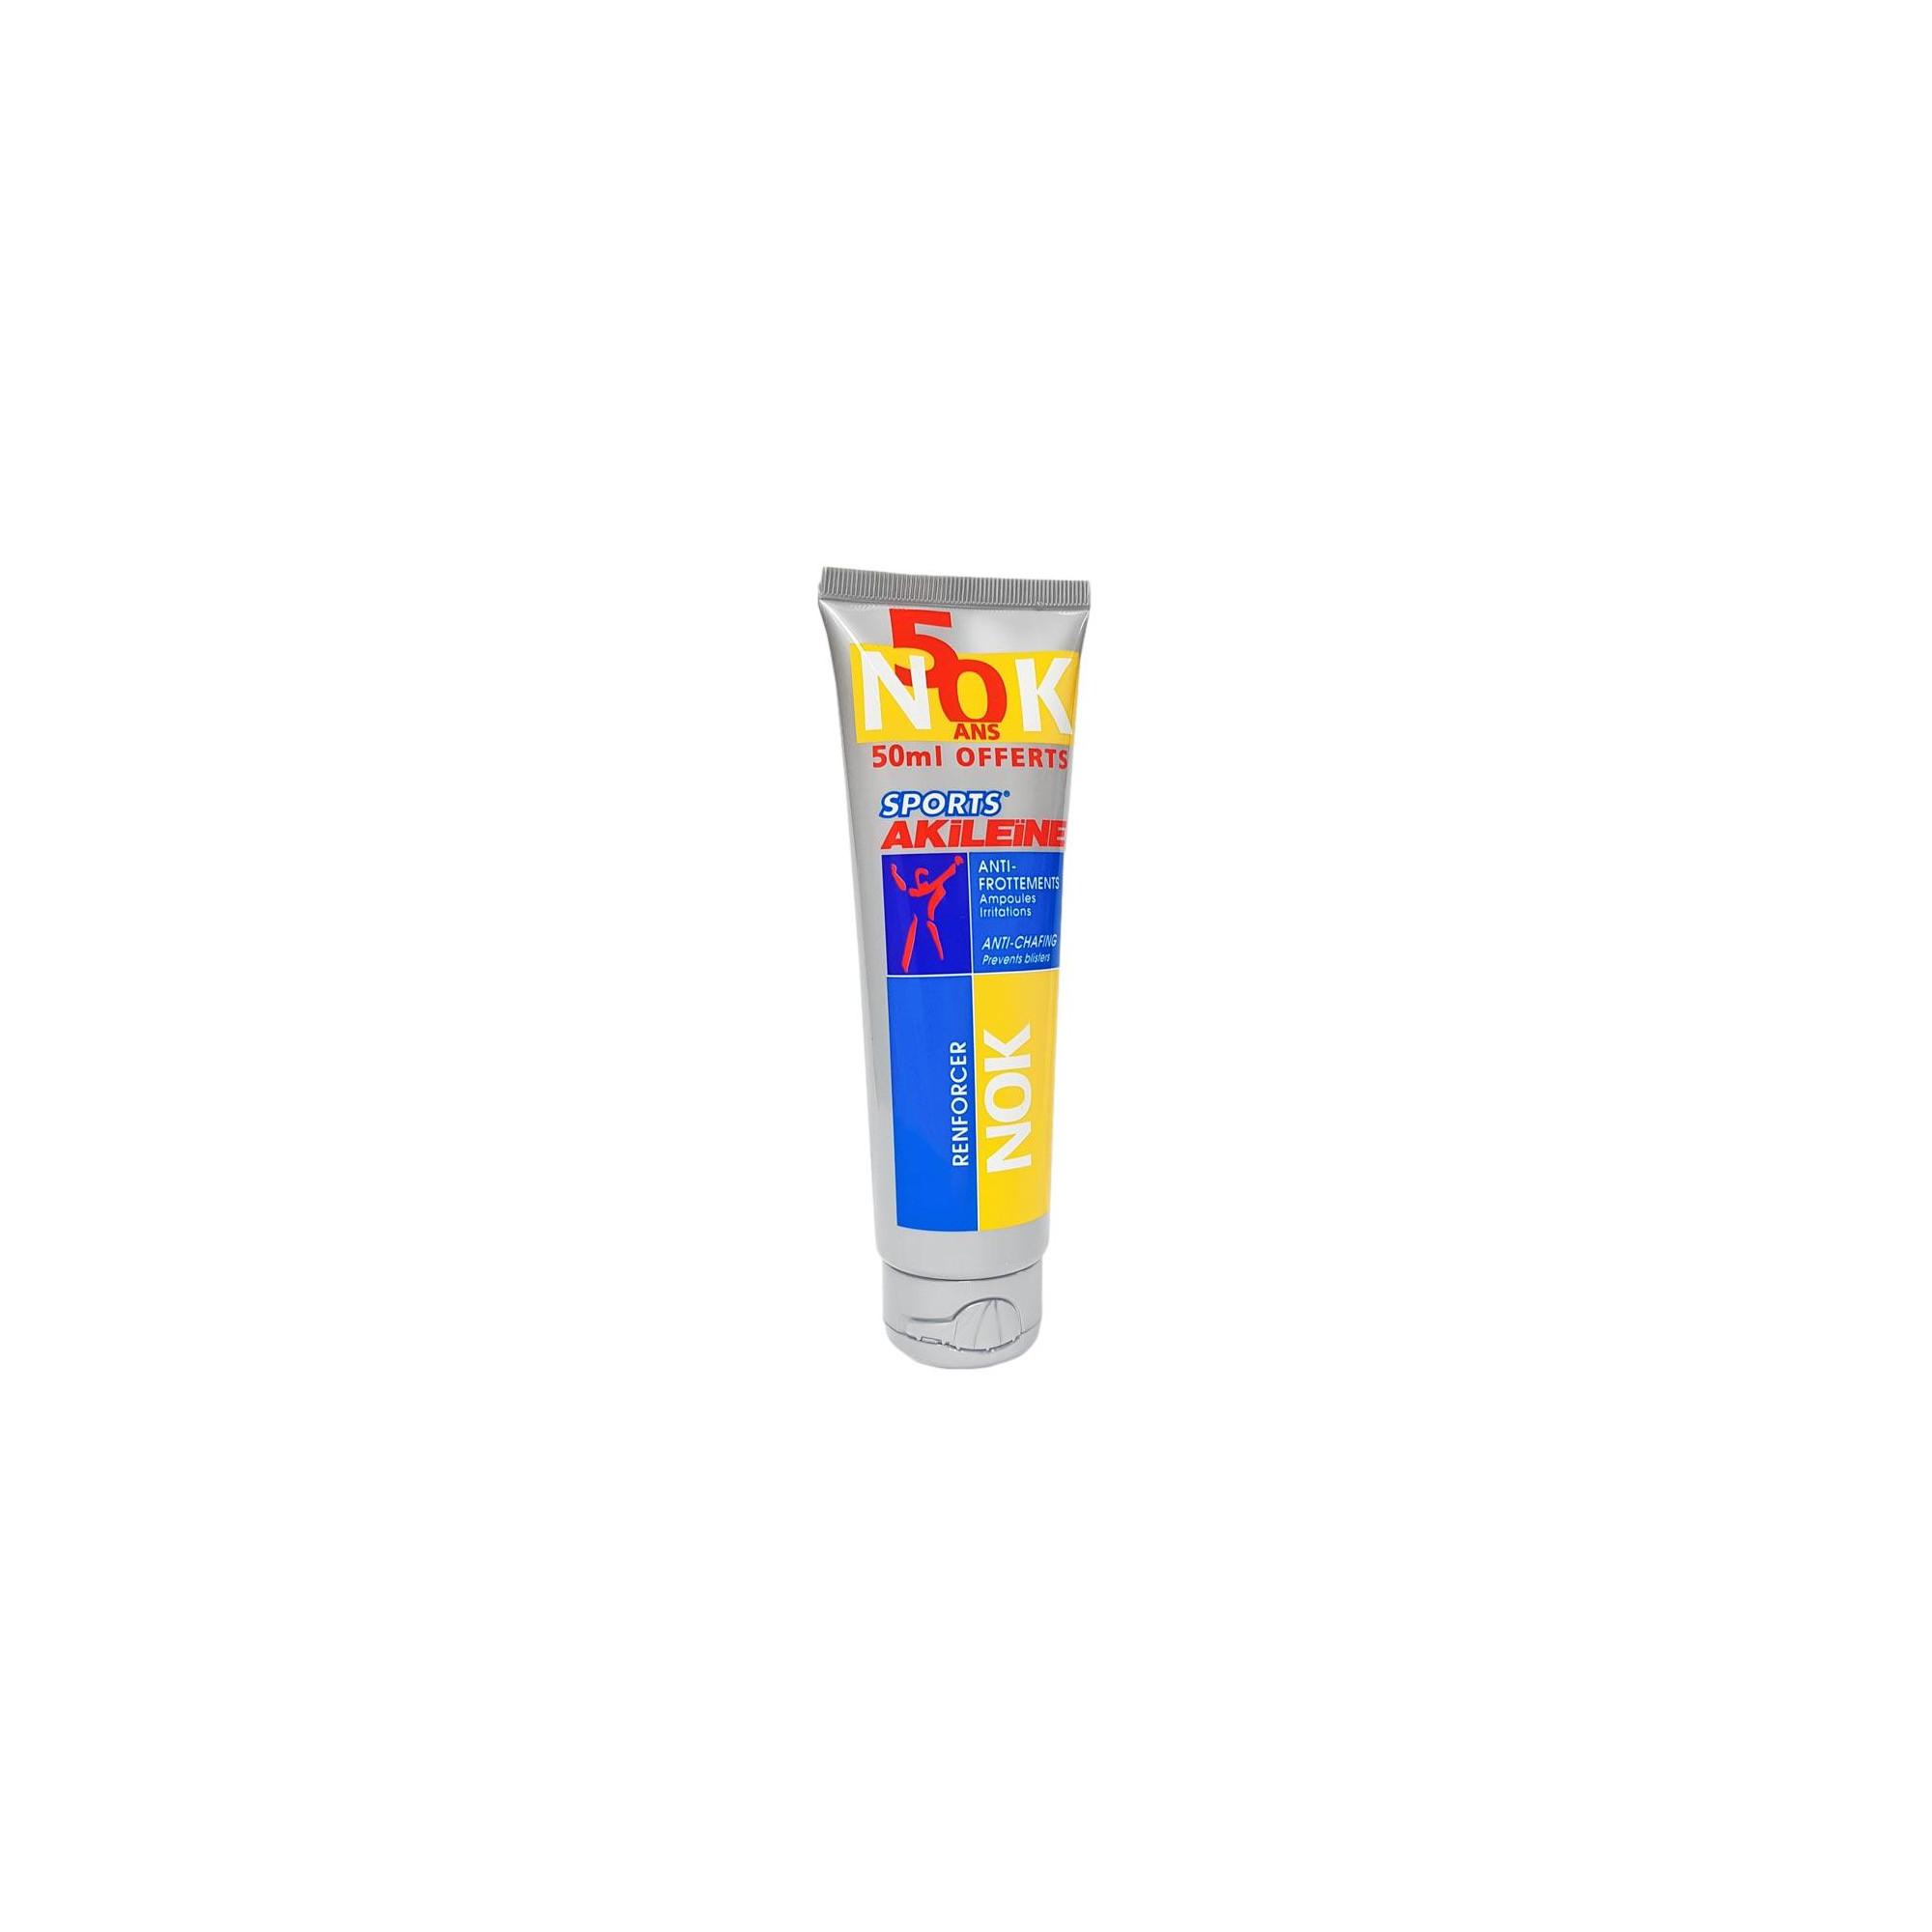 NOK crème anti frottements tube 125 ml - AKILEINE